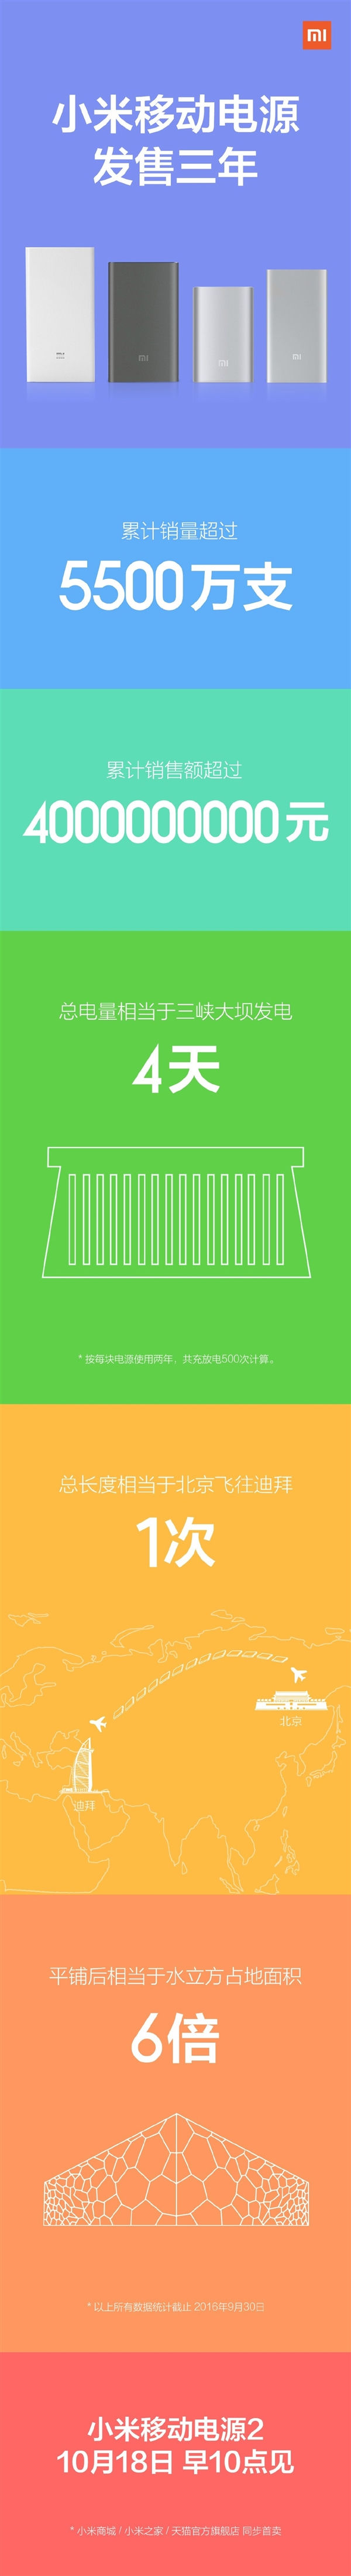 http://www.telefonguru.hu/images/content/mi-power-banks-statistics.jpg